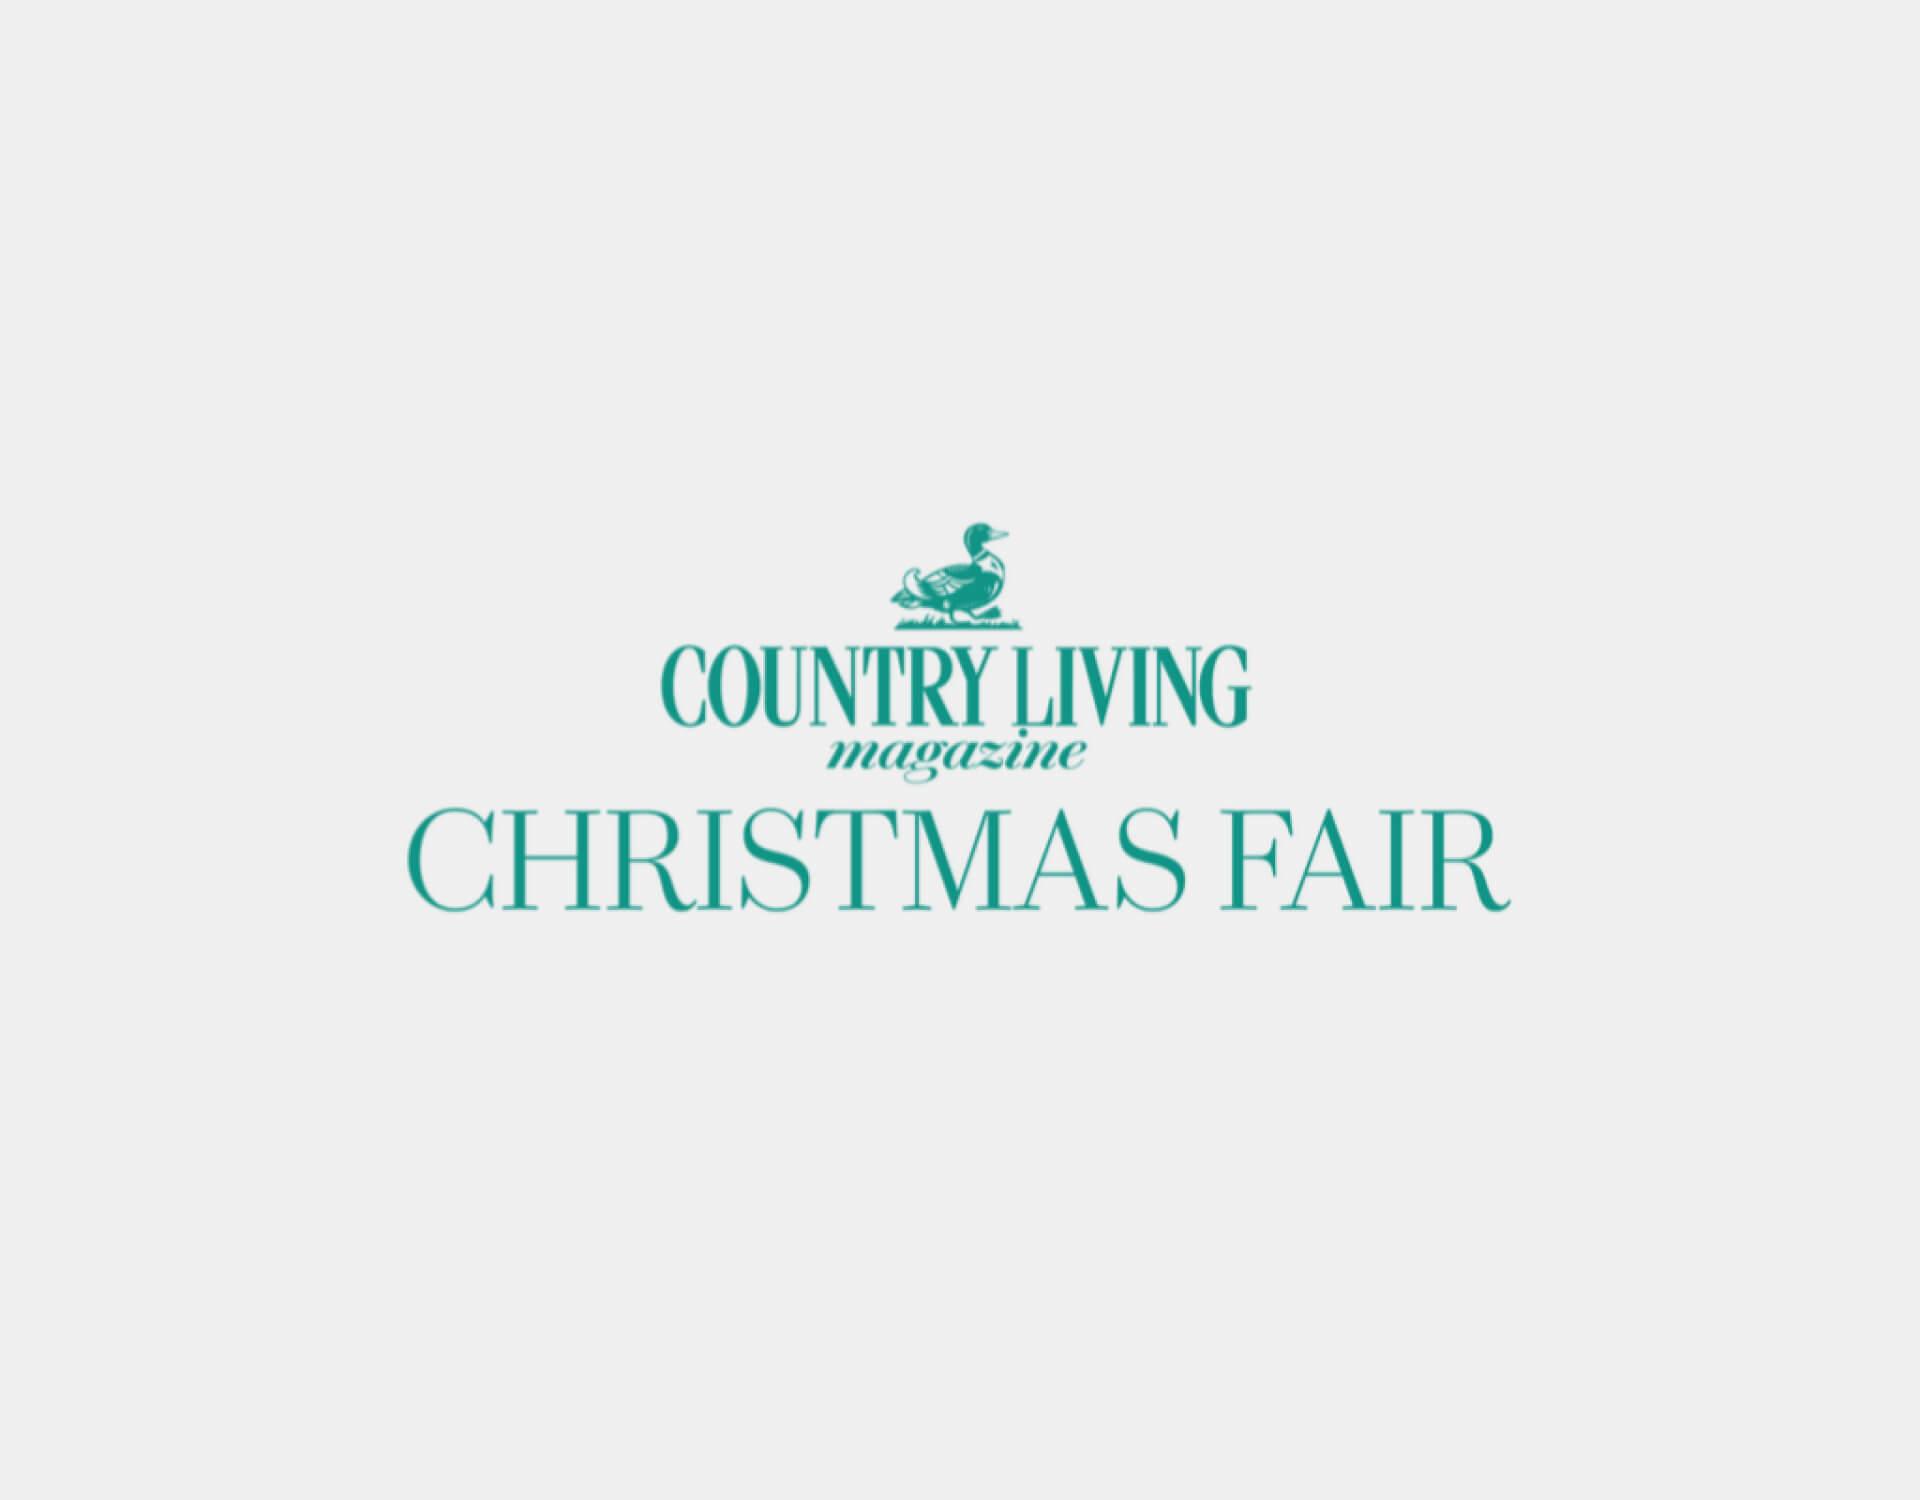 Country Living Christmas Fair London